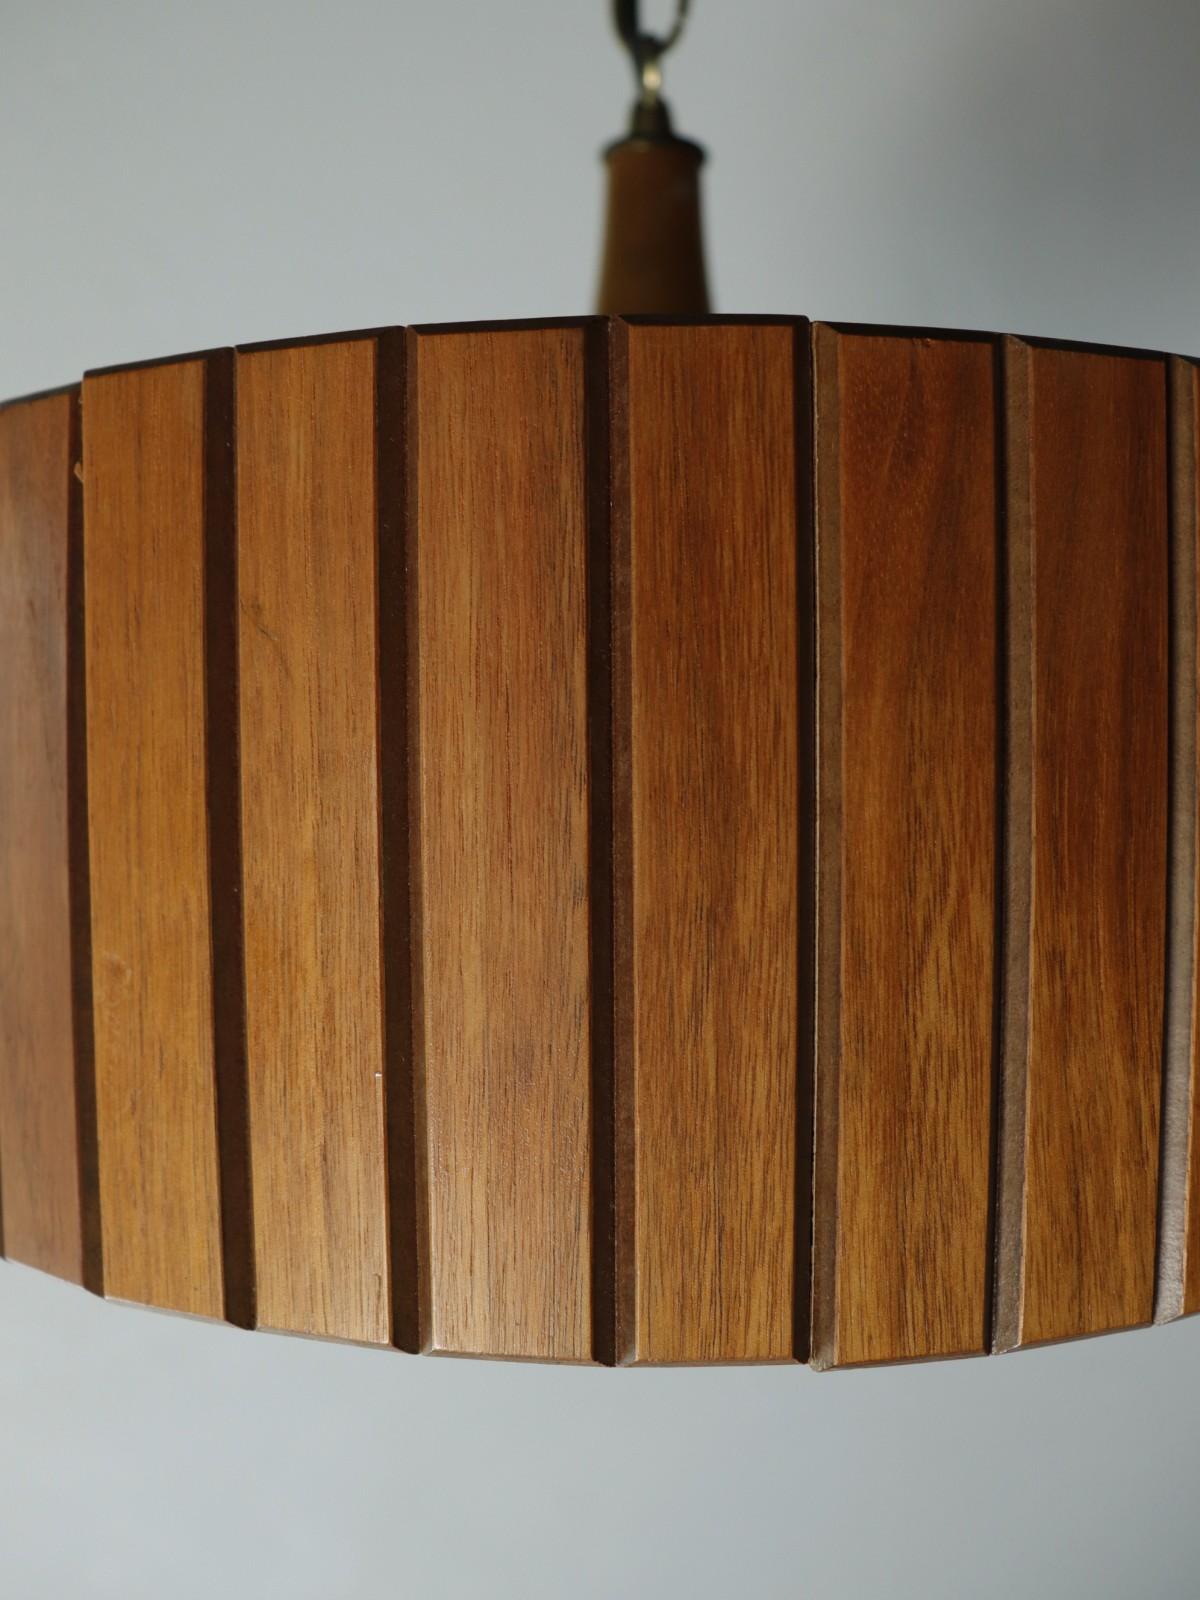 MCM, 1970's lamp, USA